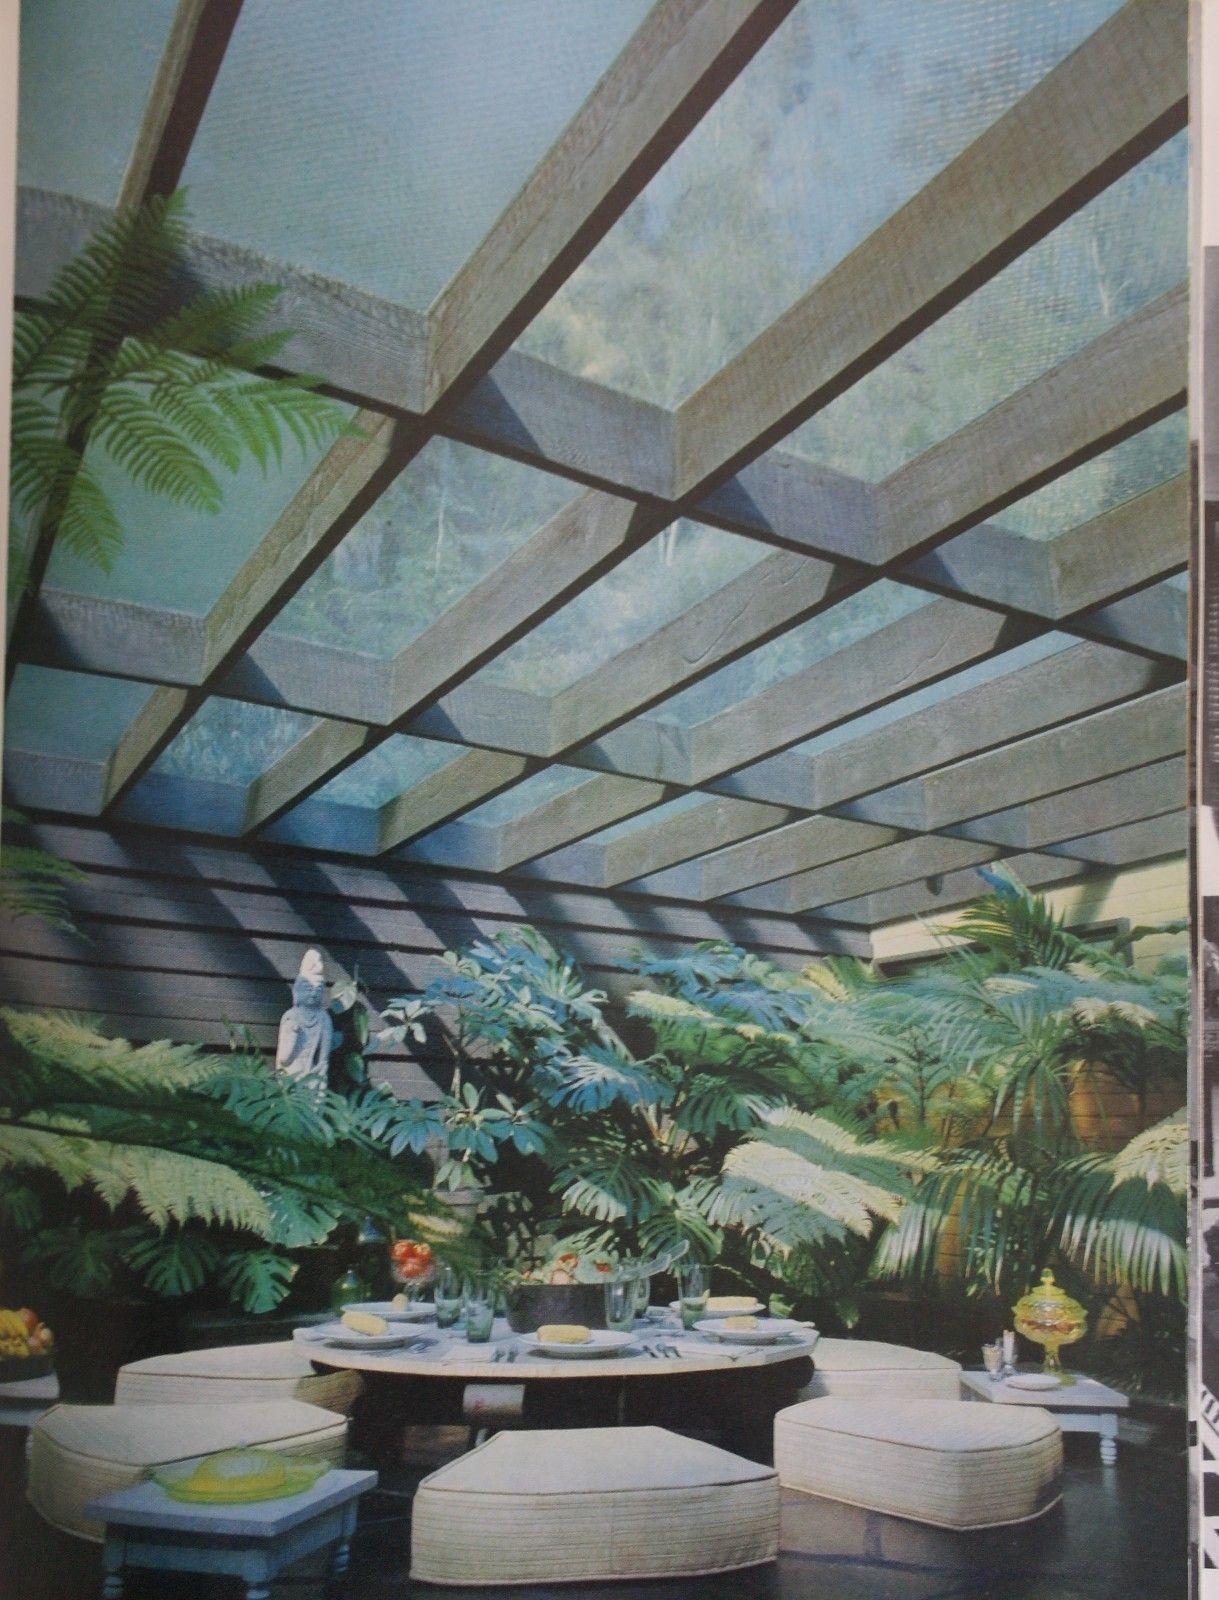 1960 House & Gardens Guide to Interior Decoration Mid Century Design on 1960 landscape design, 1960 furniture design, 1960 living room design, 1960 lighting design, 1960 mid century interior design, 1960 kitchen design, 1960 bathroom design,